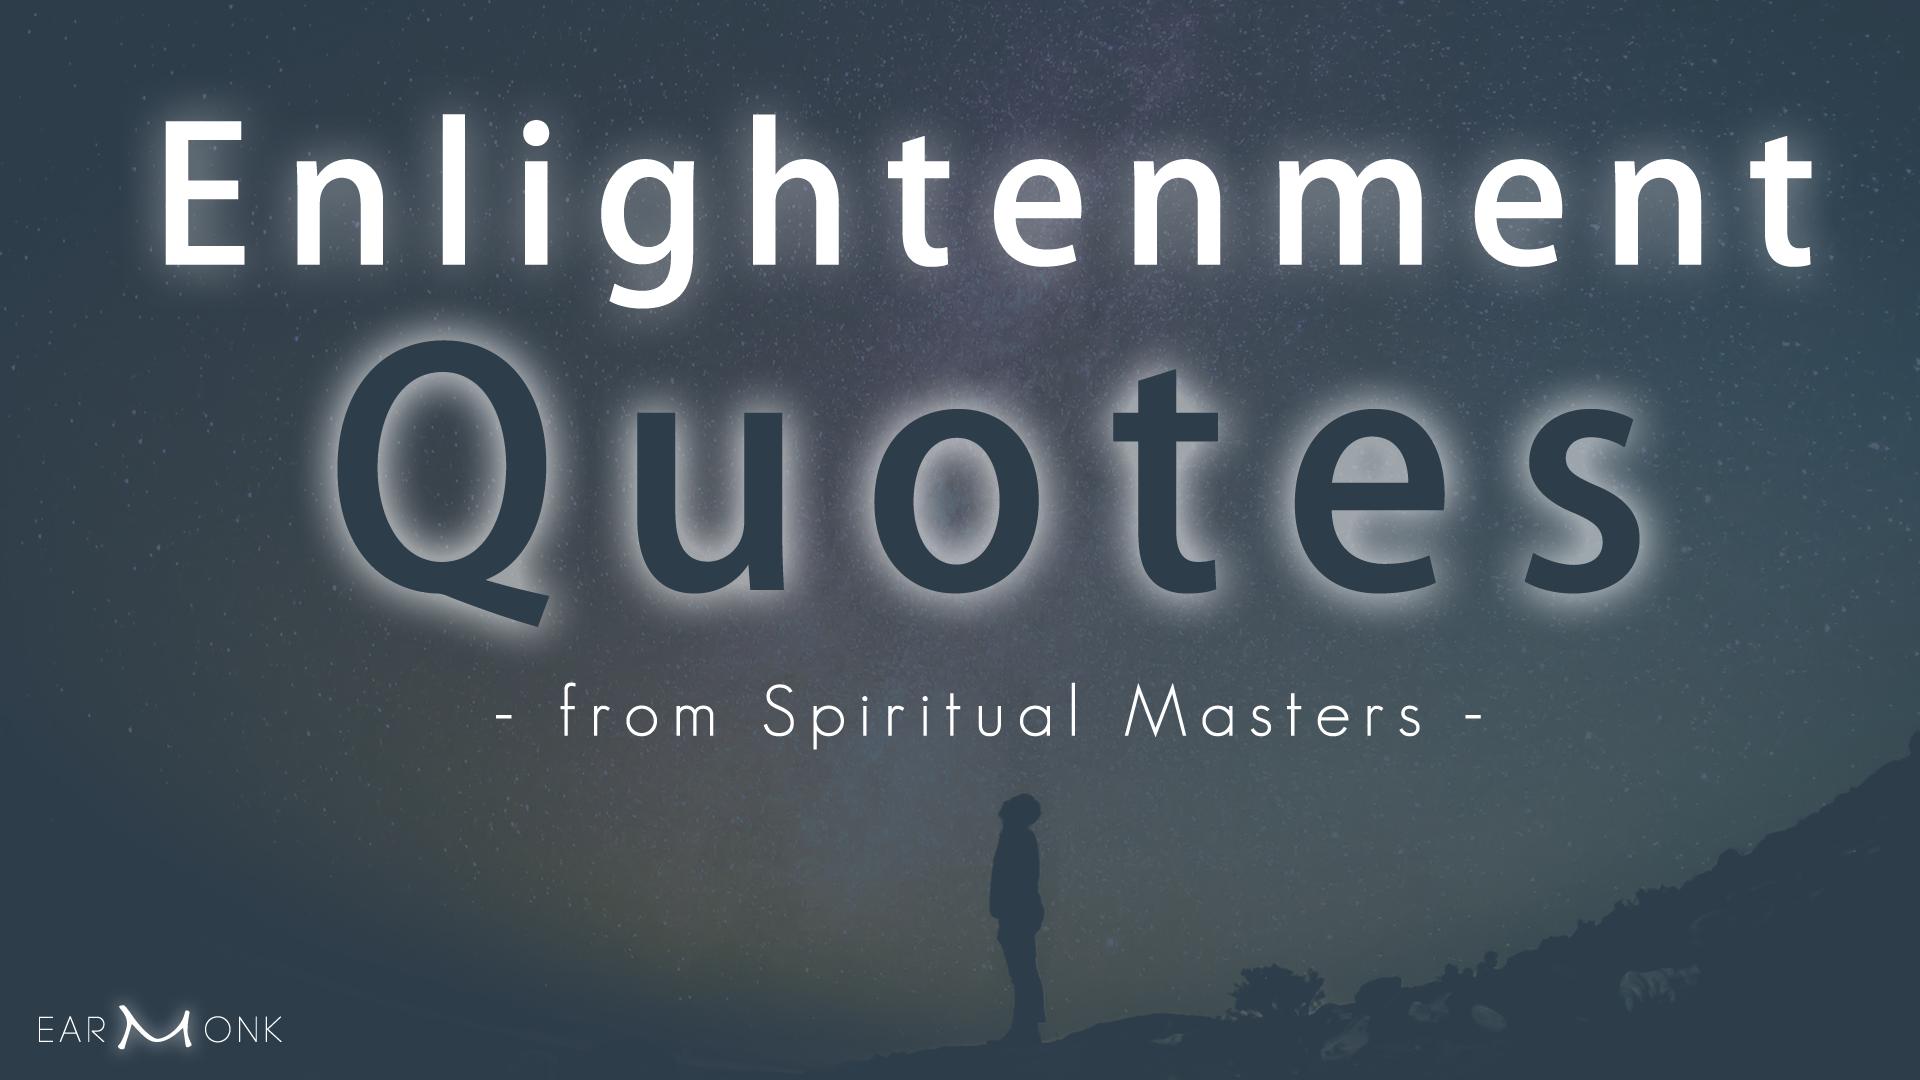 enlightenment quotes spiritual masters